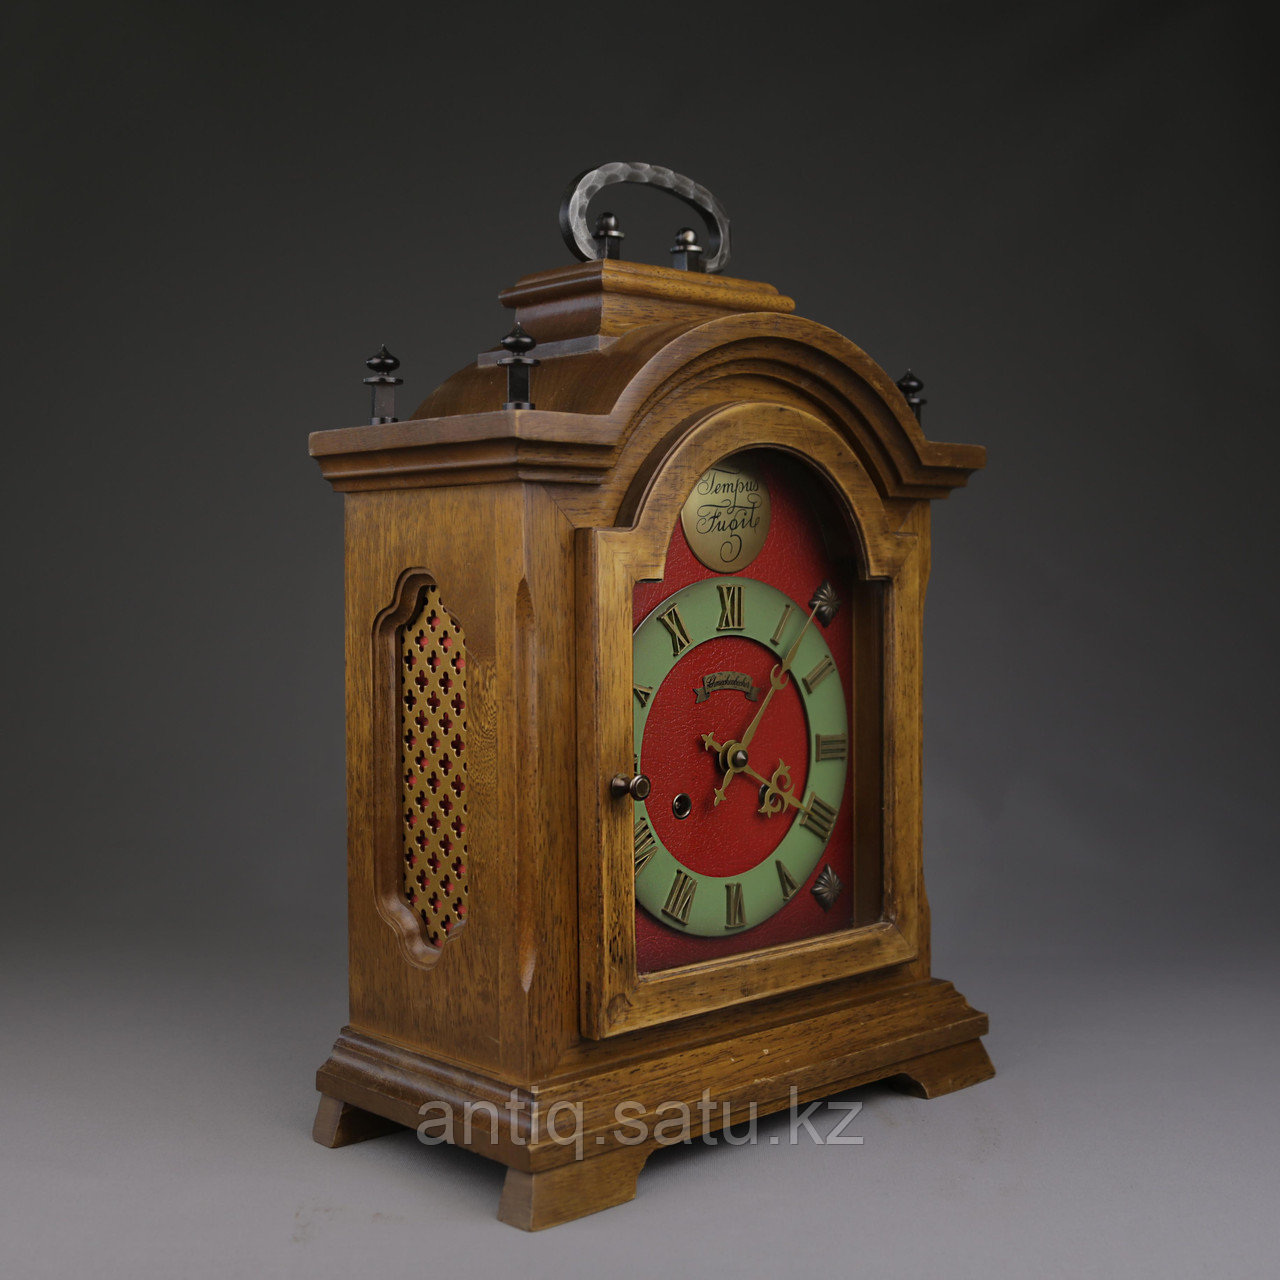 Настольные часы. Часовая мастерская Emil Schmeckenbecher - фото 3